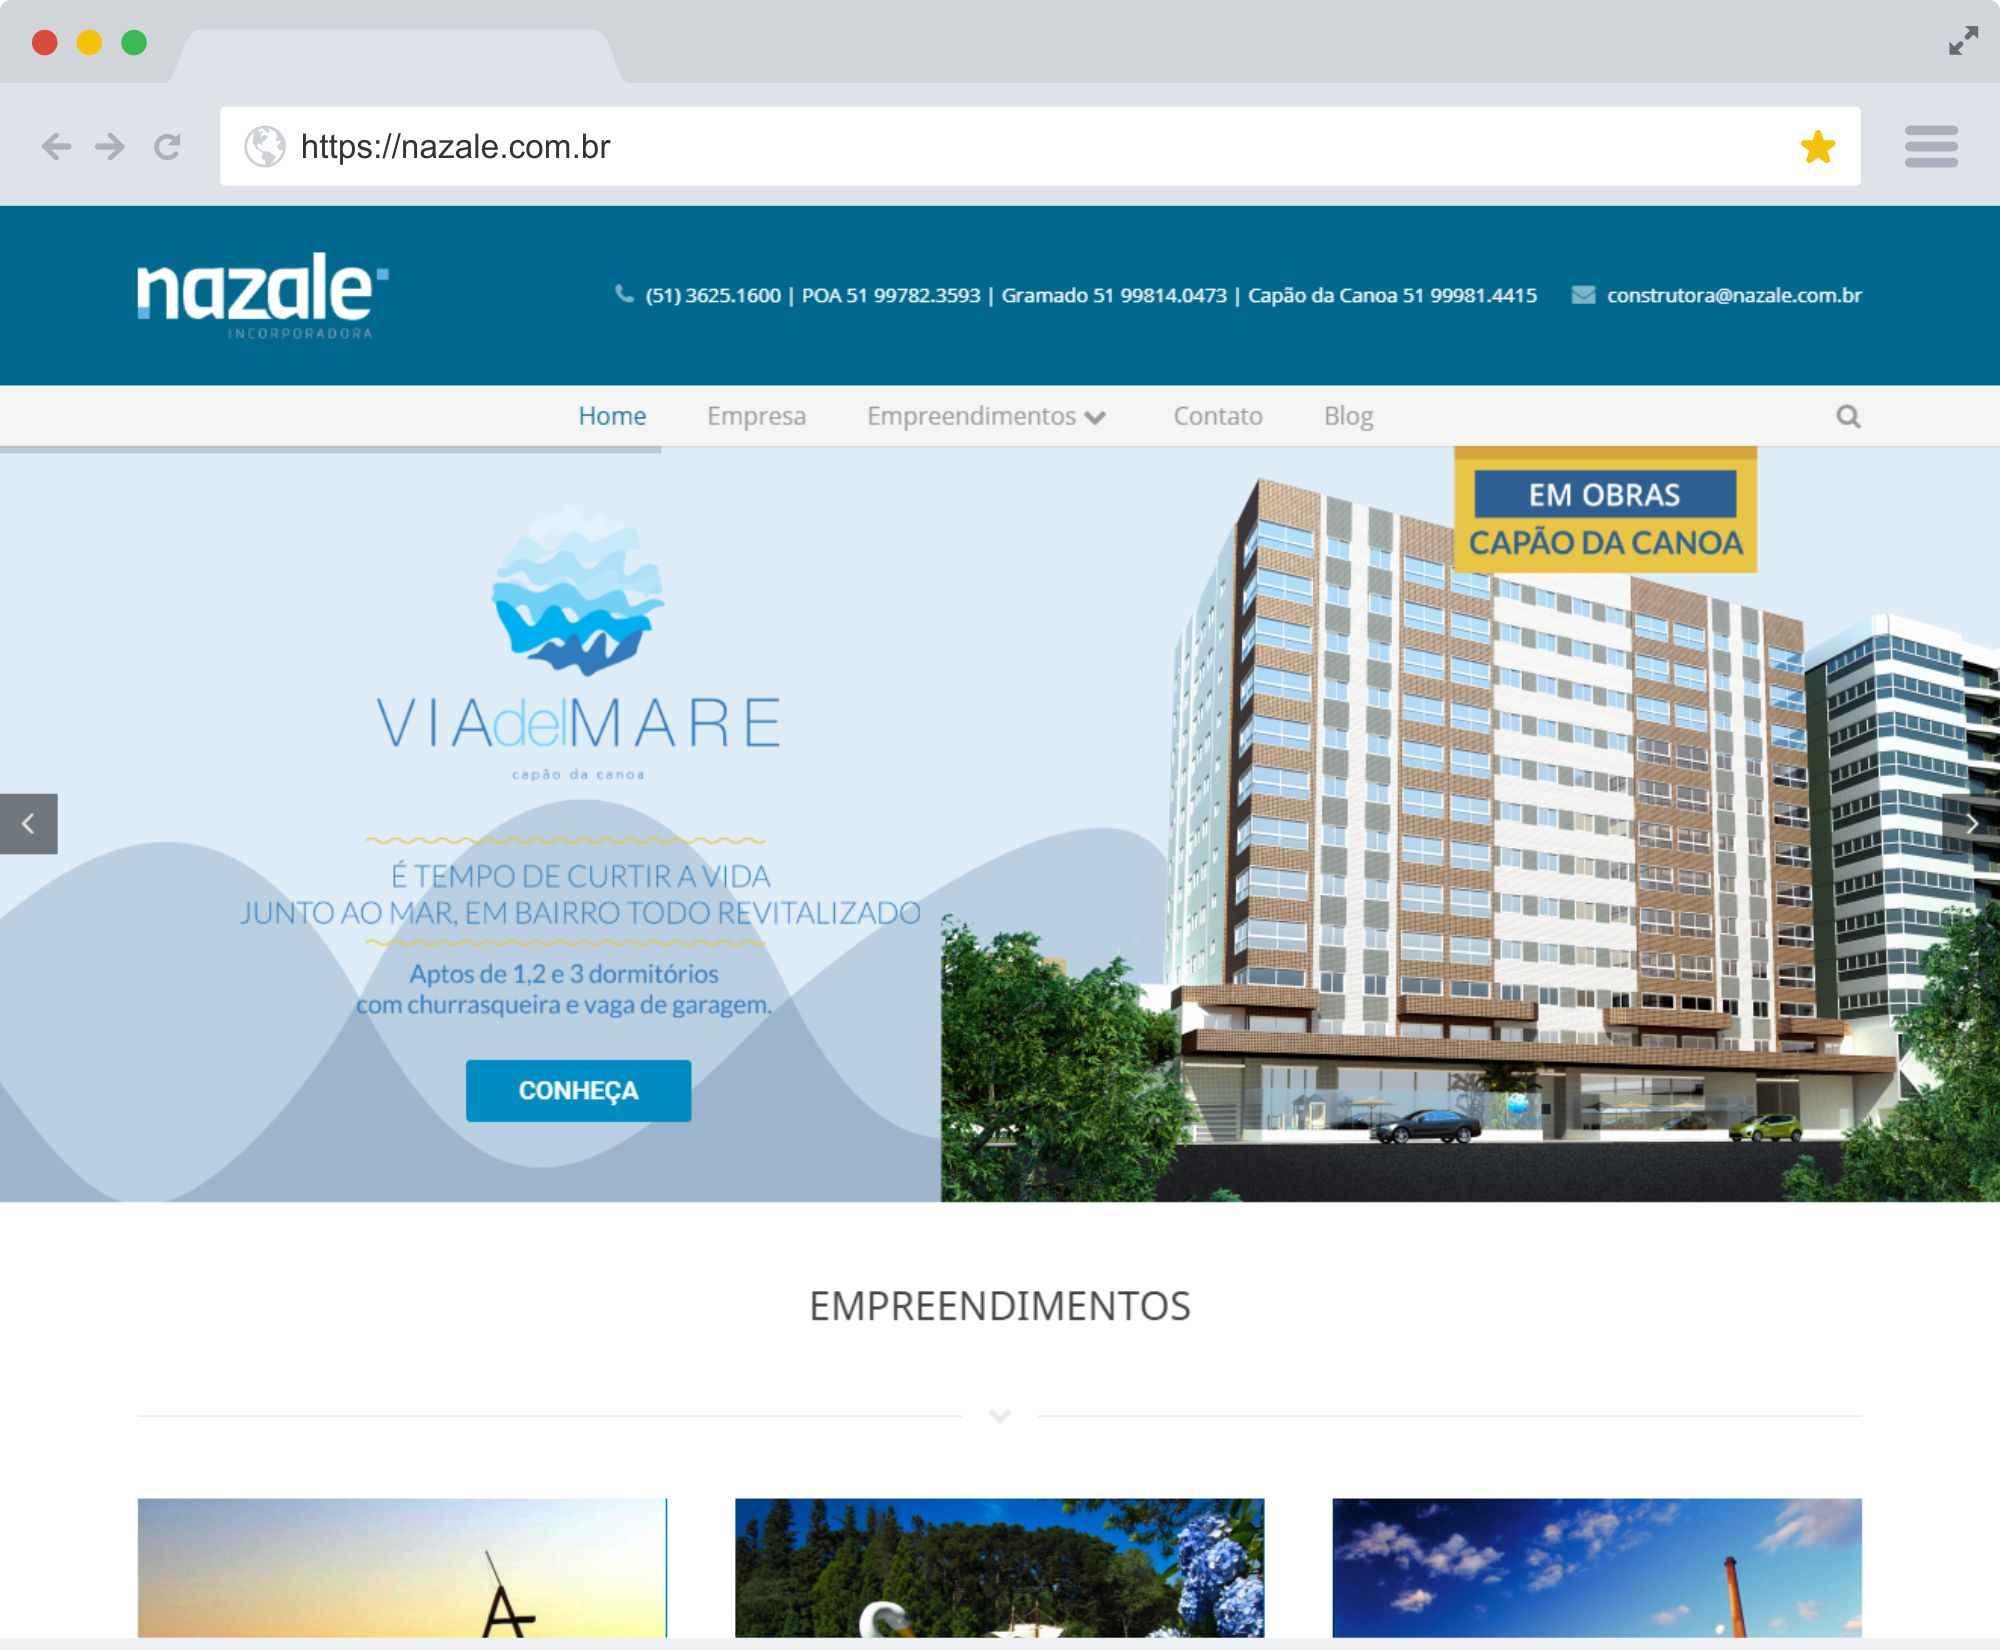 nazale.com.br